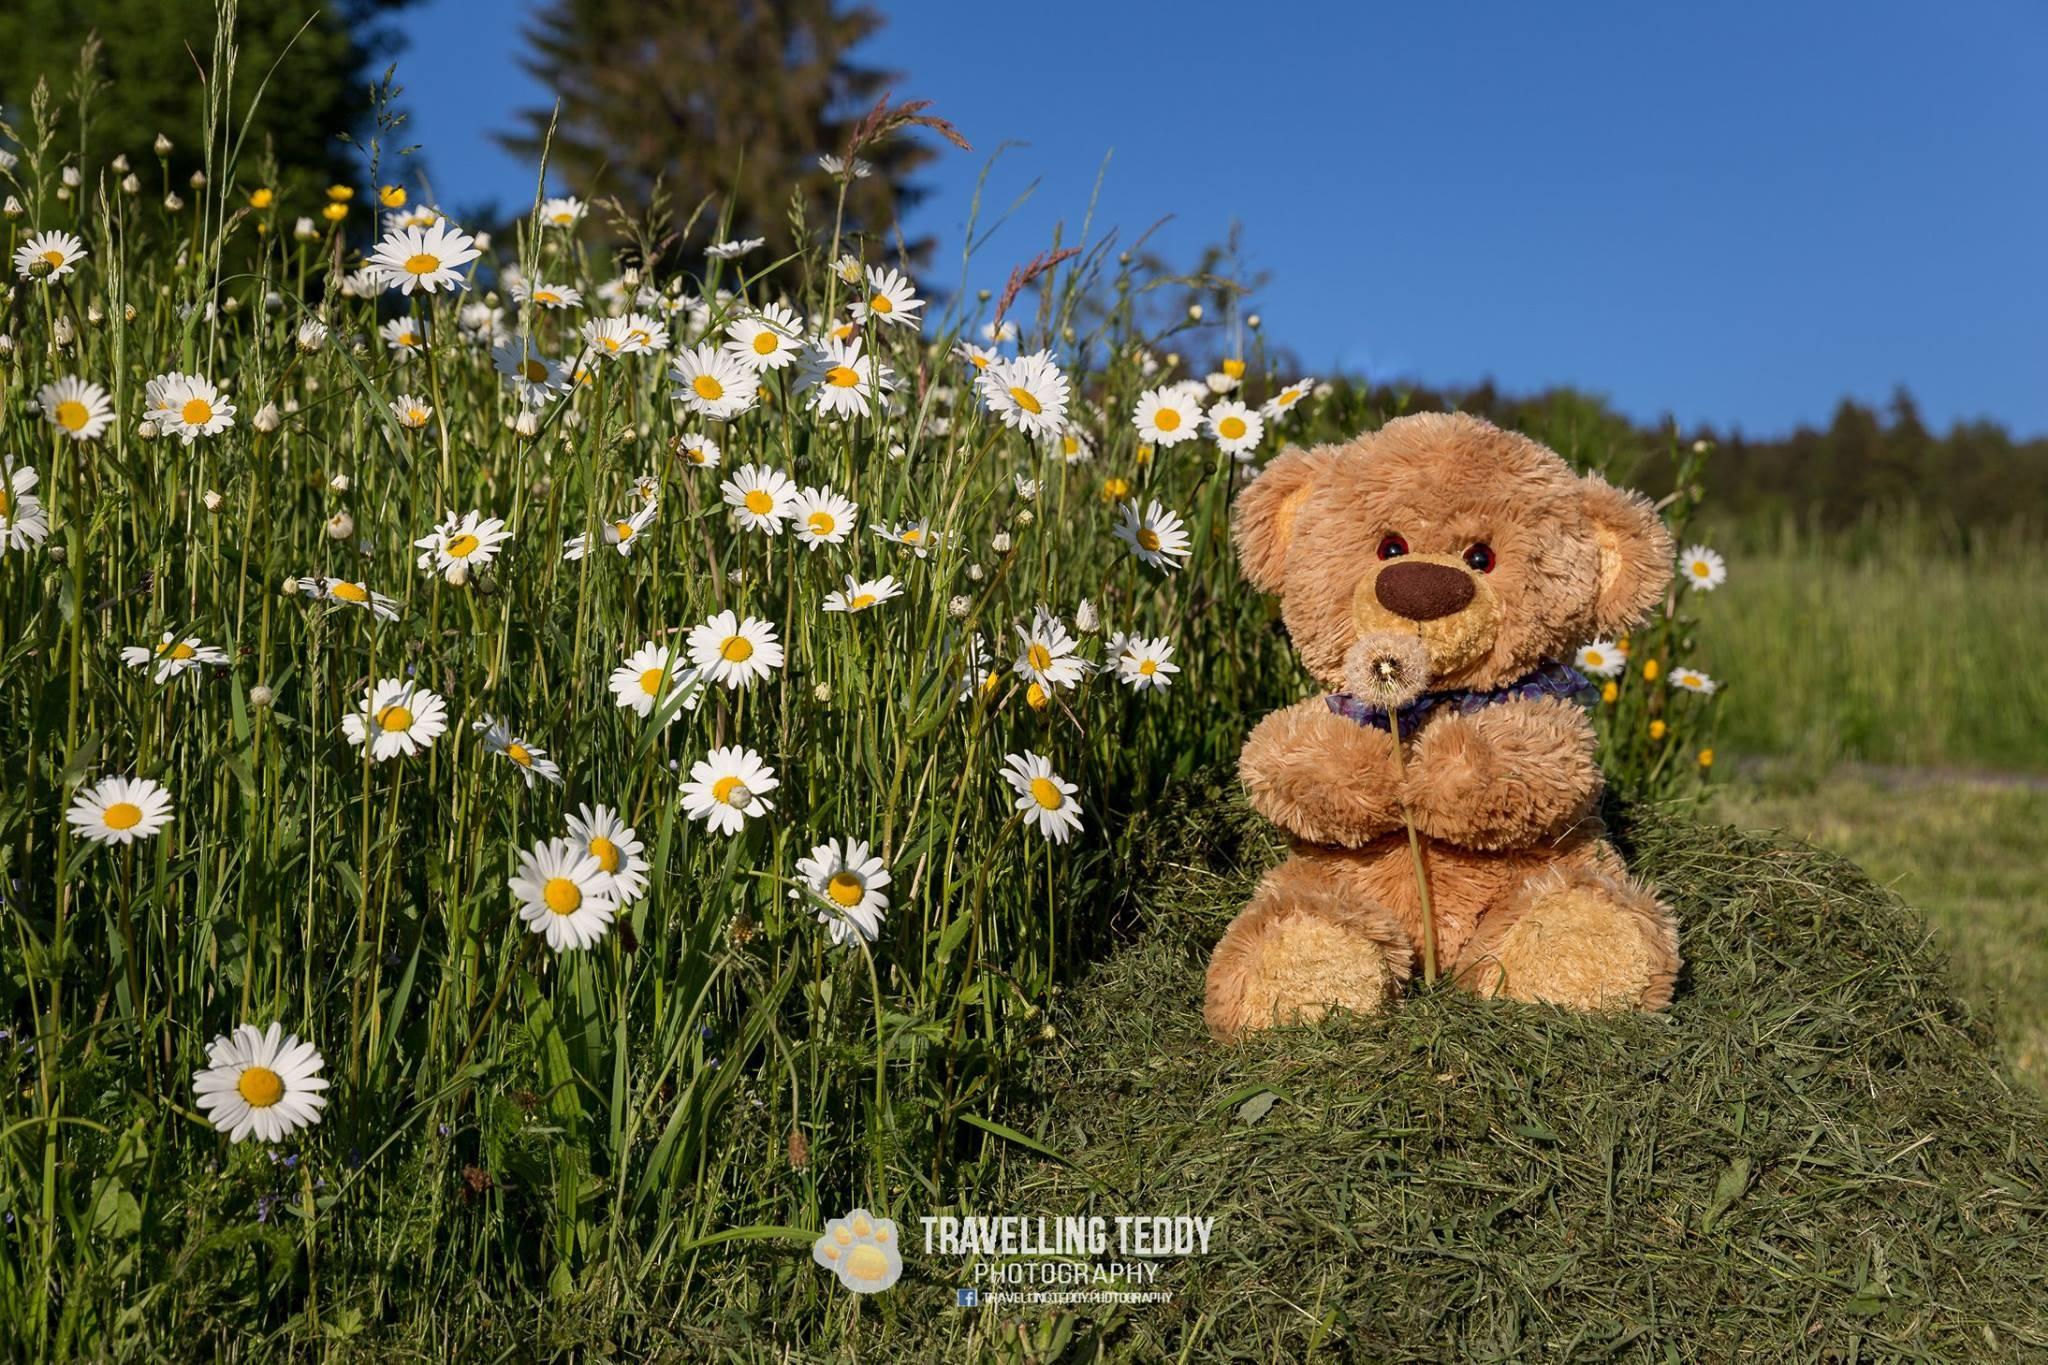 Teddy loves flowers by Christian Kneidinger